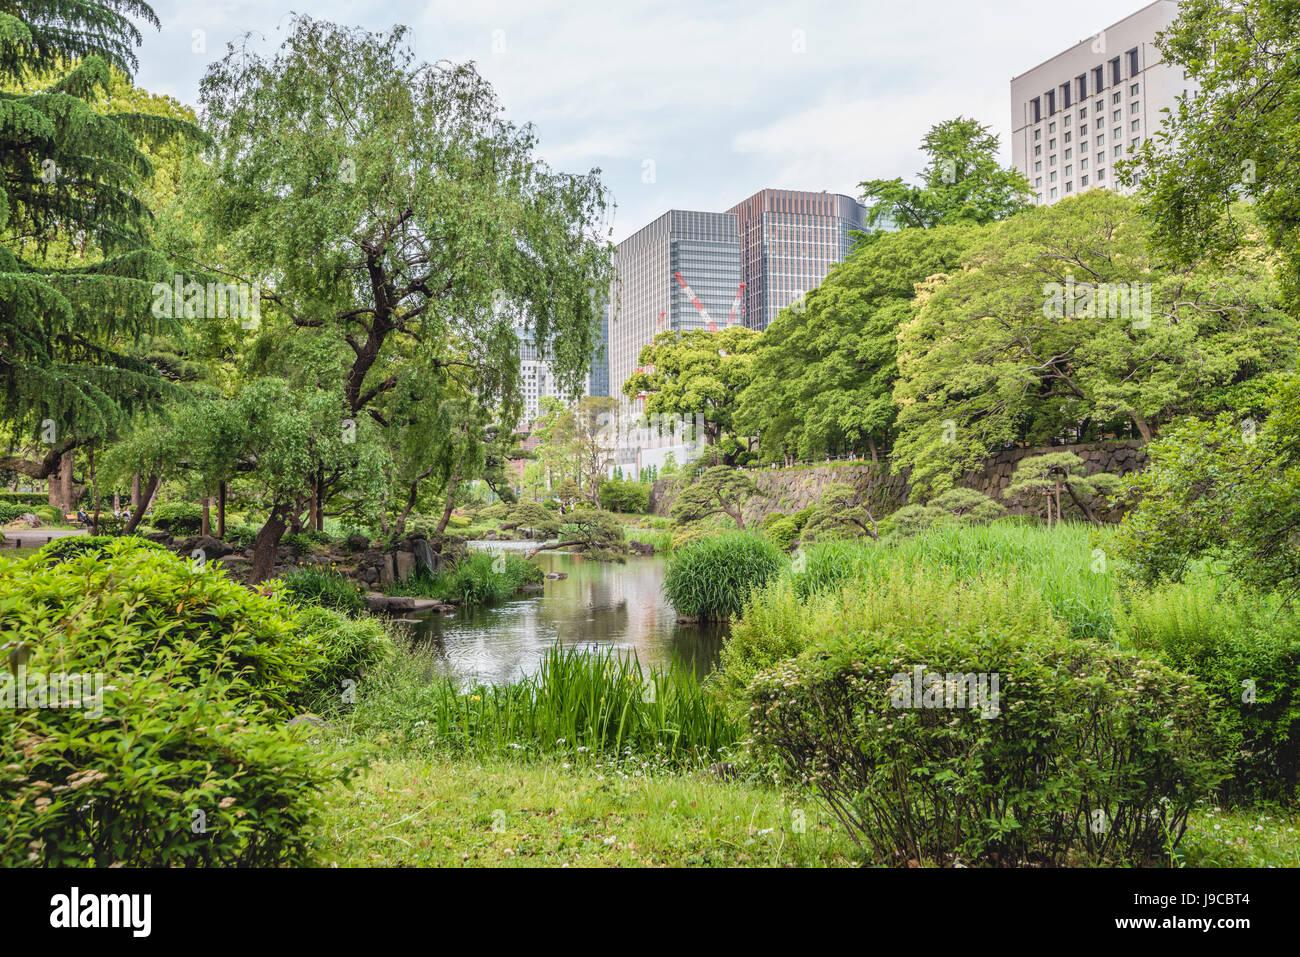 Hibiya Park (Hibiyakōen) in Chiyoda-ku, Tokyo, Japan | Hibiya Park (Hibiyakōen) in Chiyoda-ku, Tokyo, Japan - Stock Image